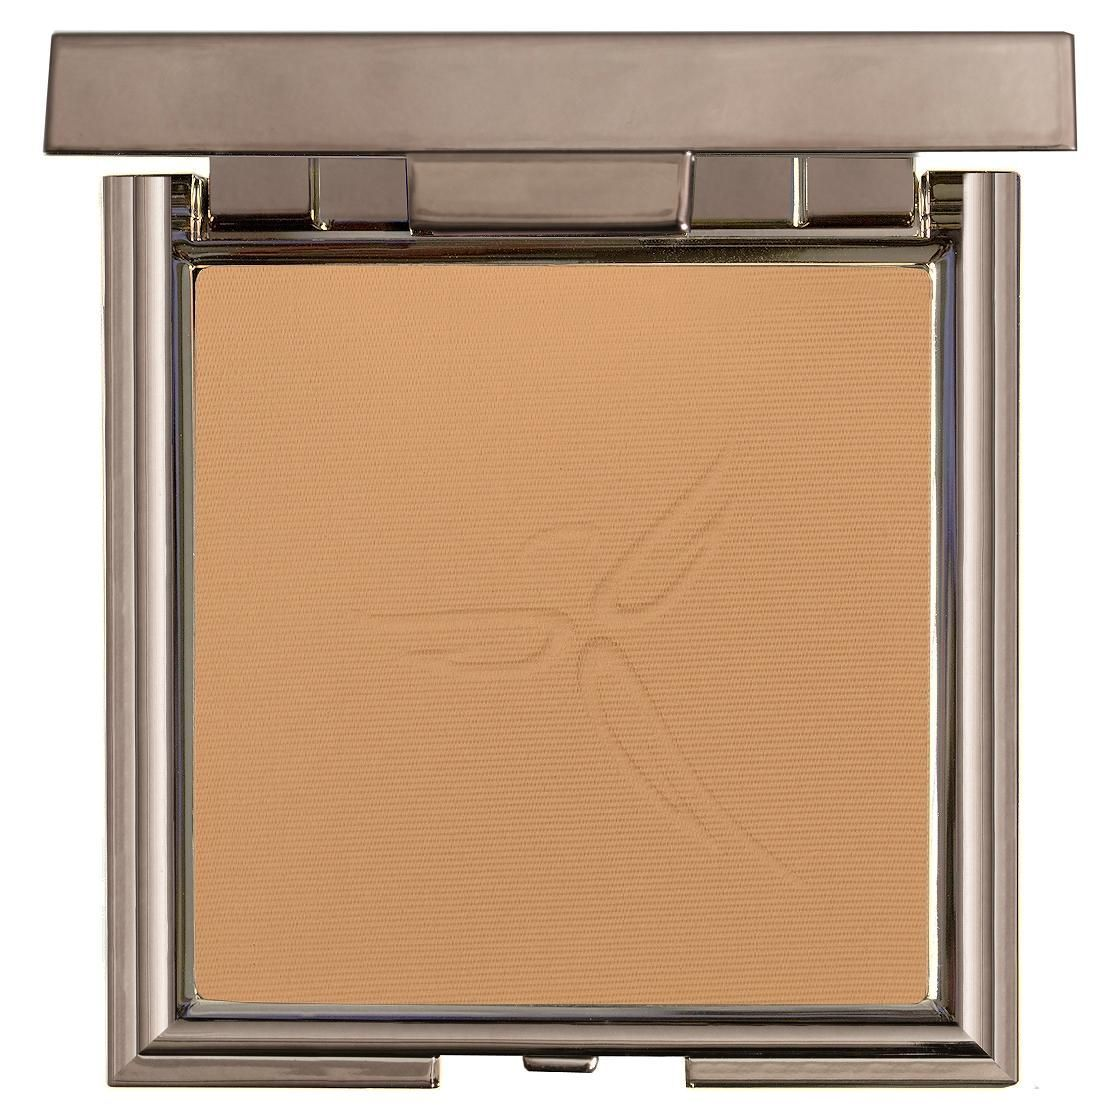 Second Skin Light Diffusing Powder Foundation N°20